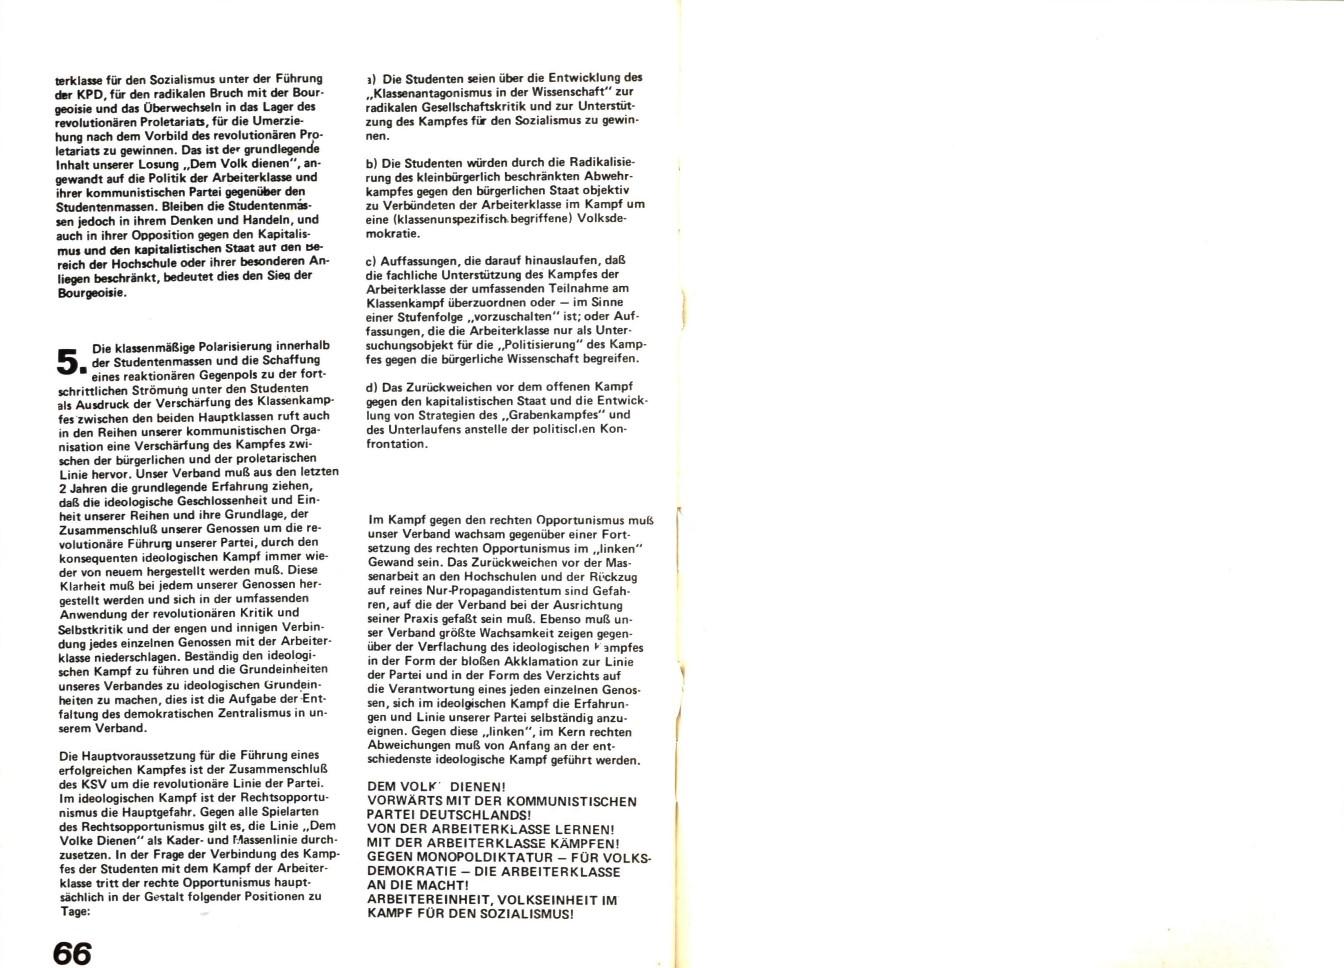 KSV_1974_Rechenschaftsbericht_35